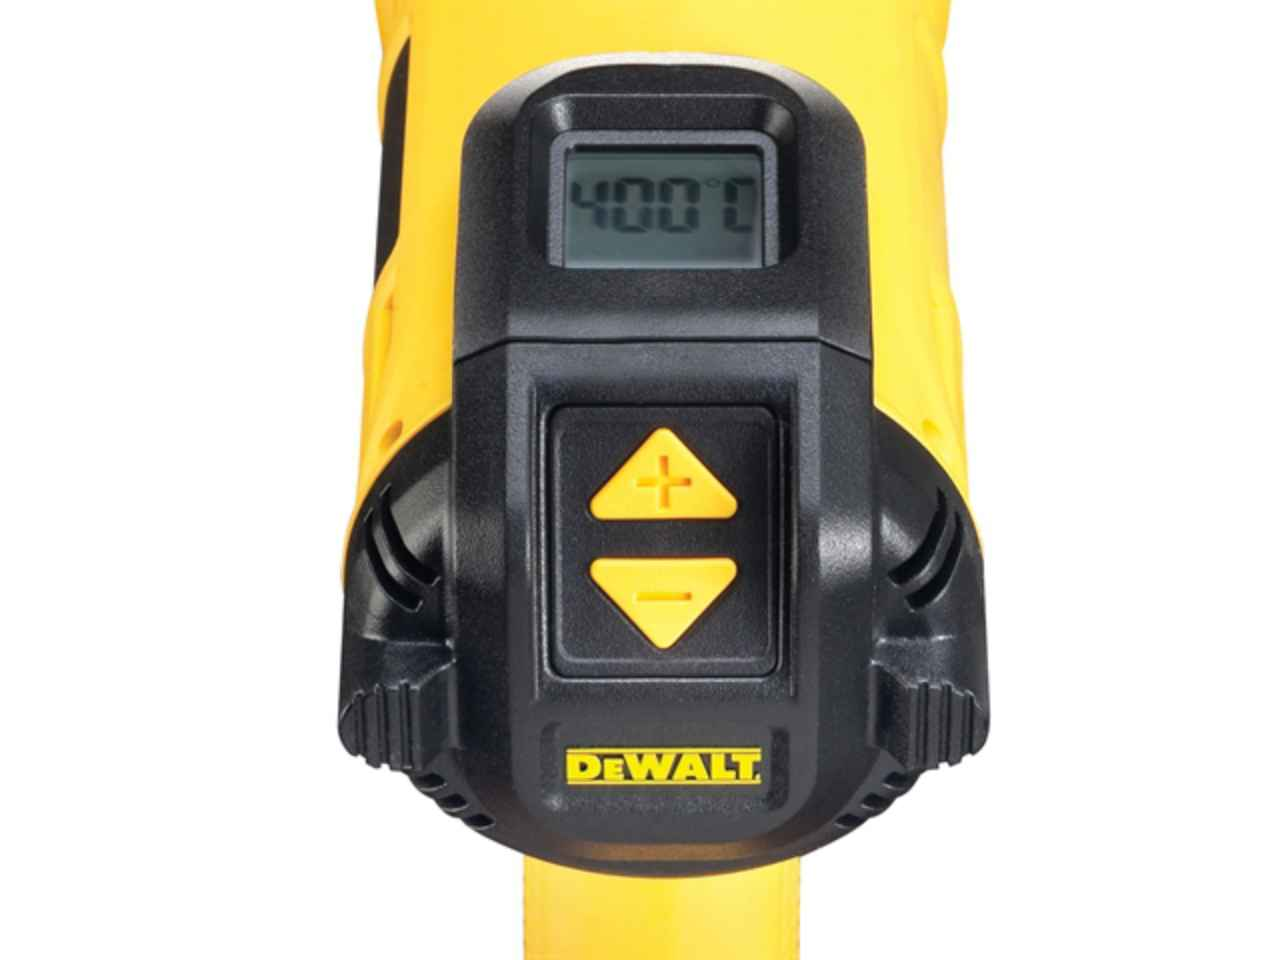 DeWalt D26414 110v LCD Premium Heatgun 1600W